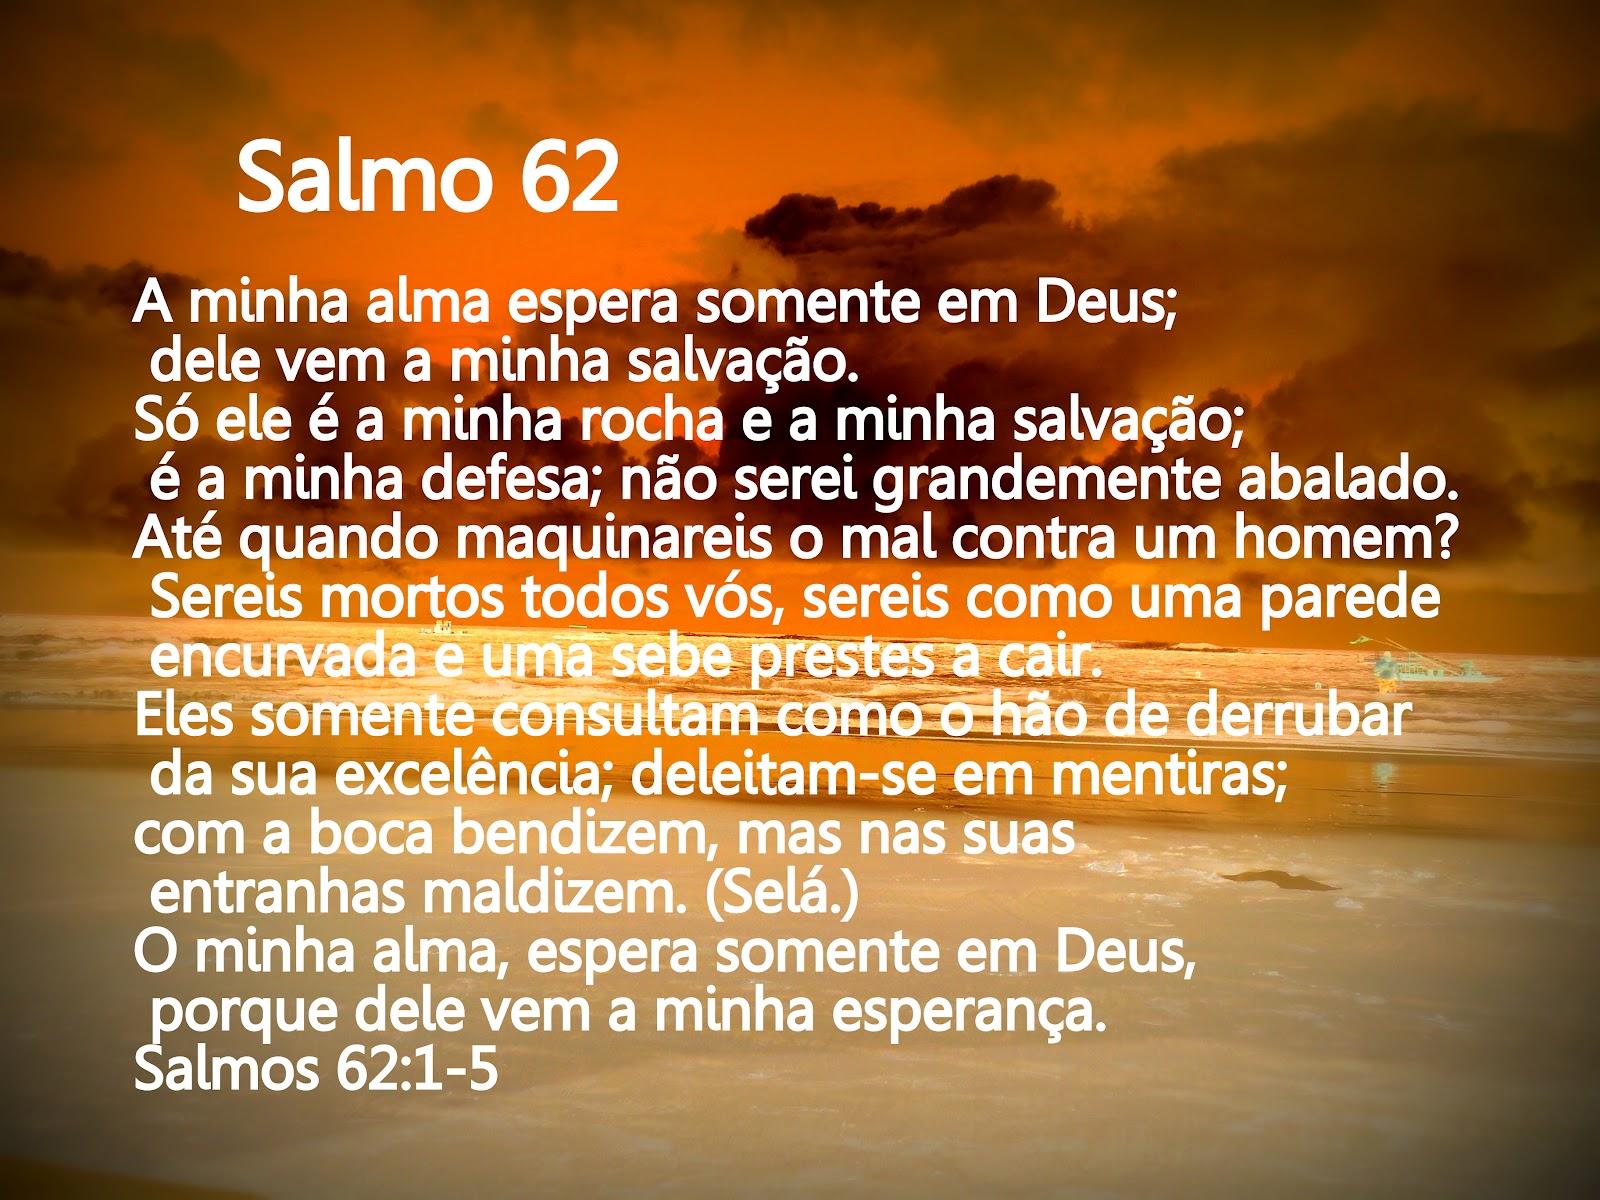 salmo - photo #19